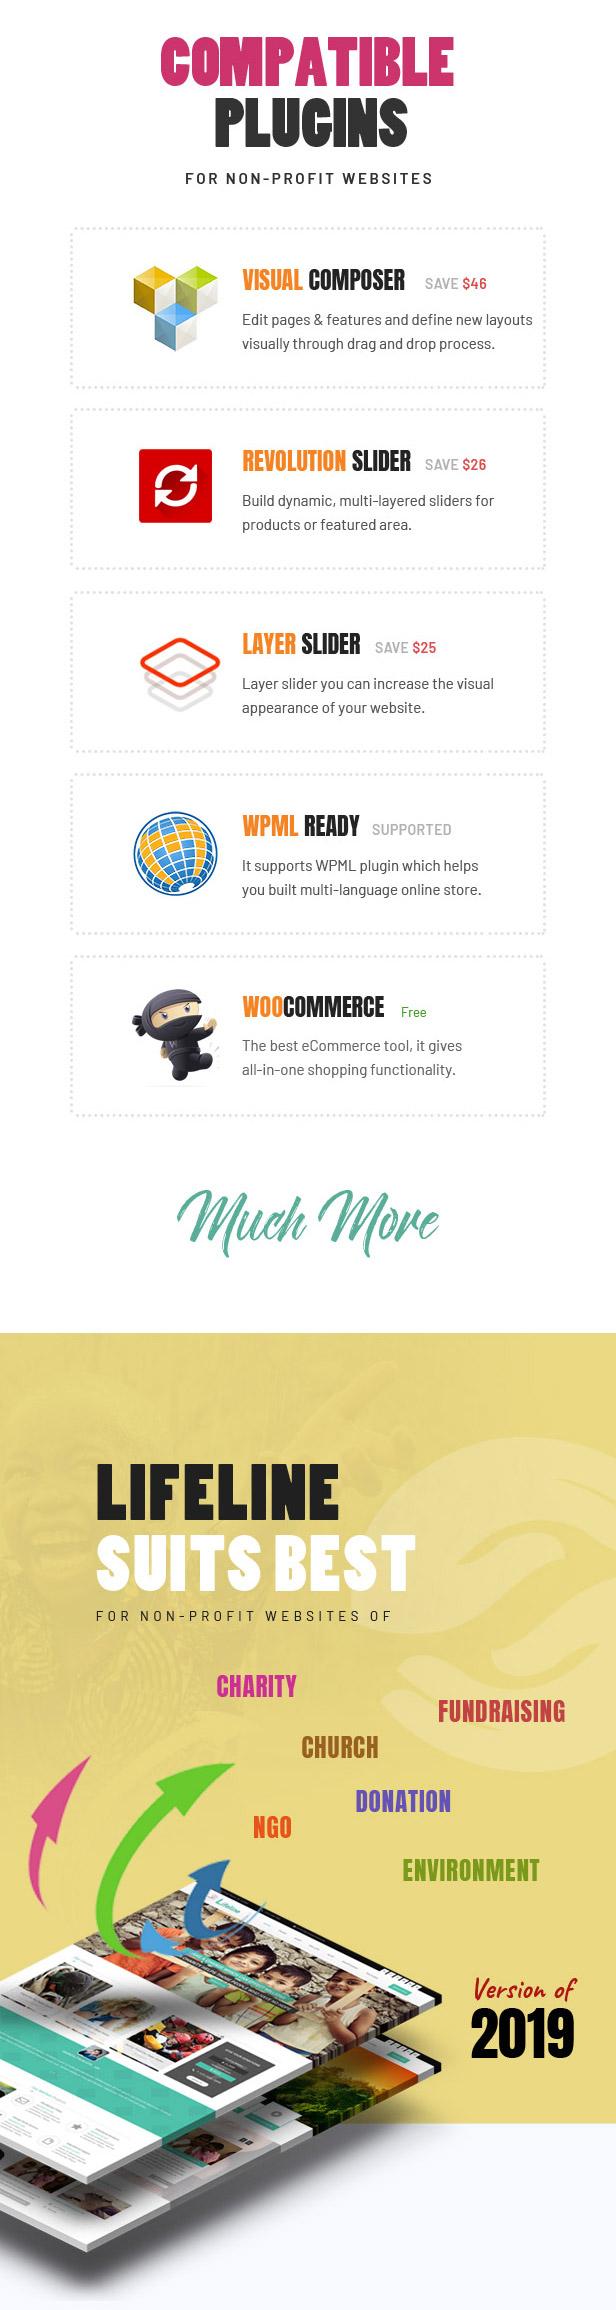 Lifeline - NGO, Fund Raising and Charity WordPress Theme - 4